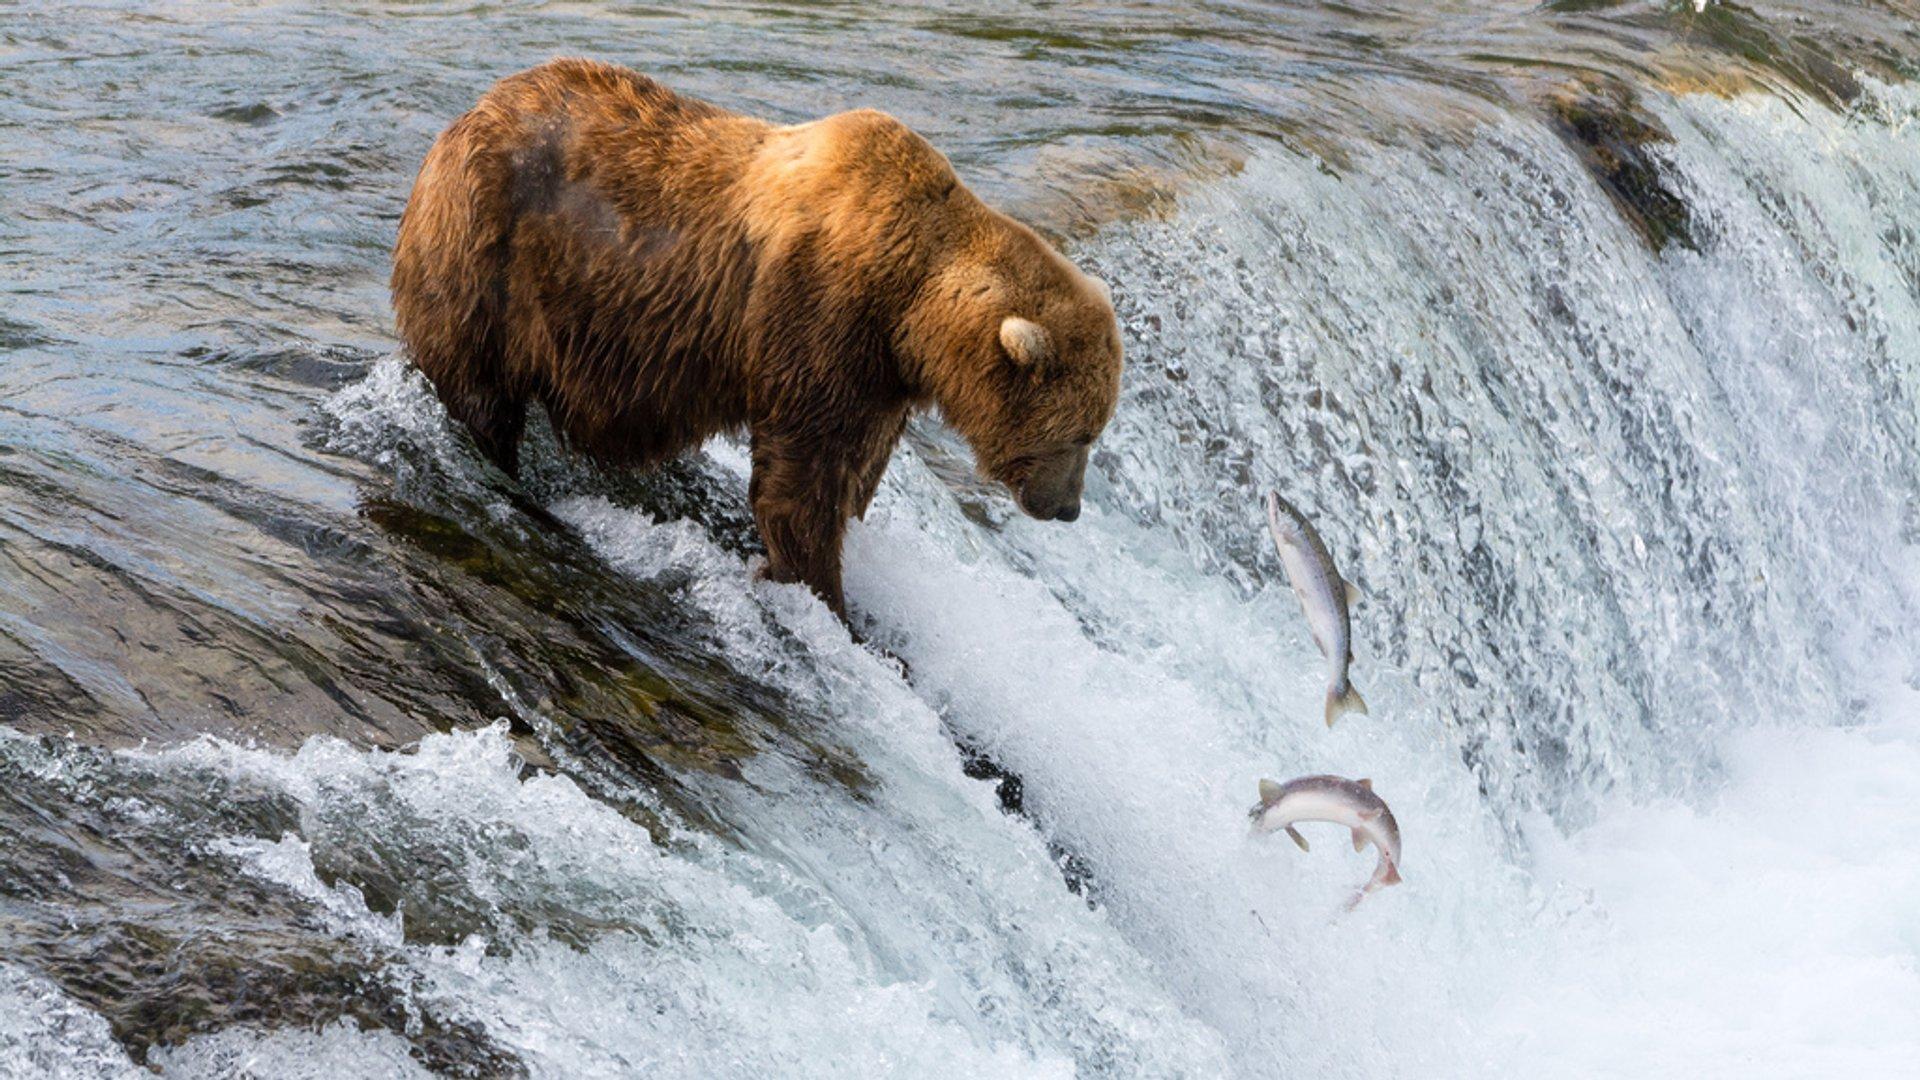 Fishing Brown Bear at Brooks Falls, Katmai National Park 2020